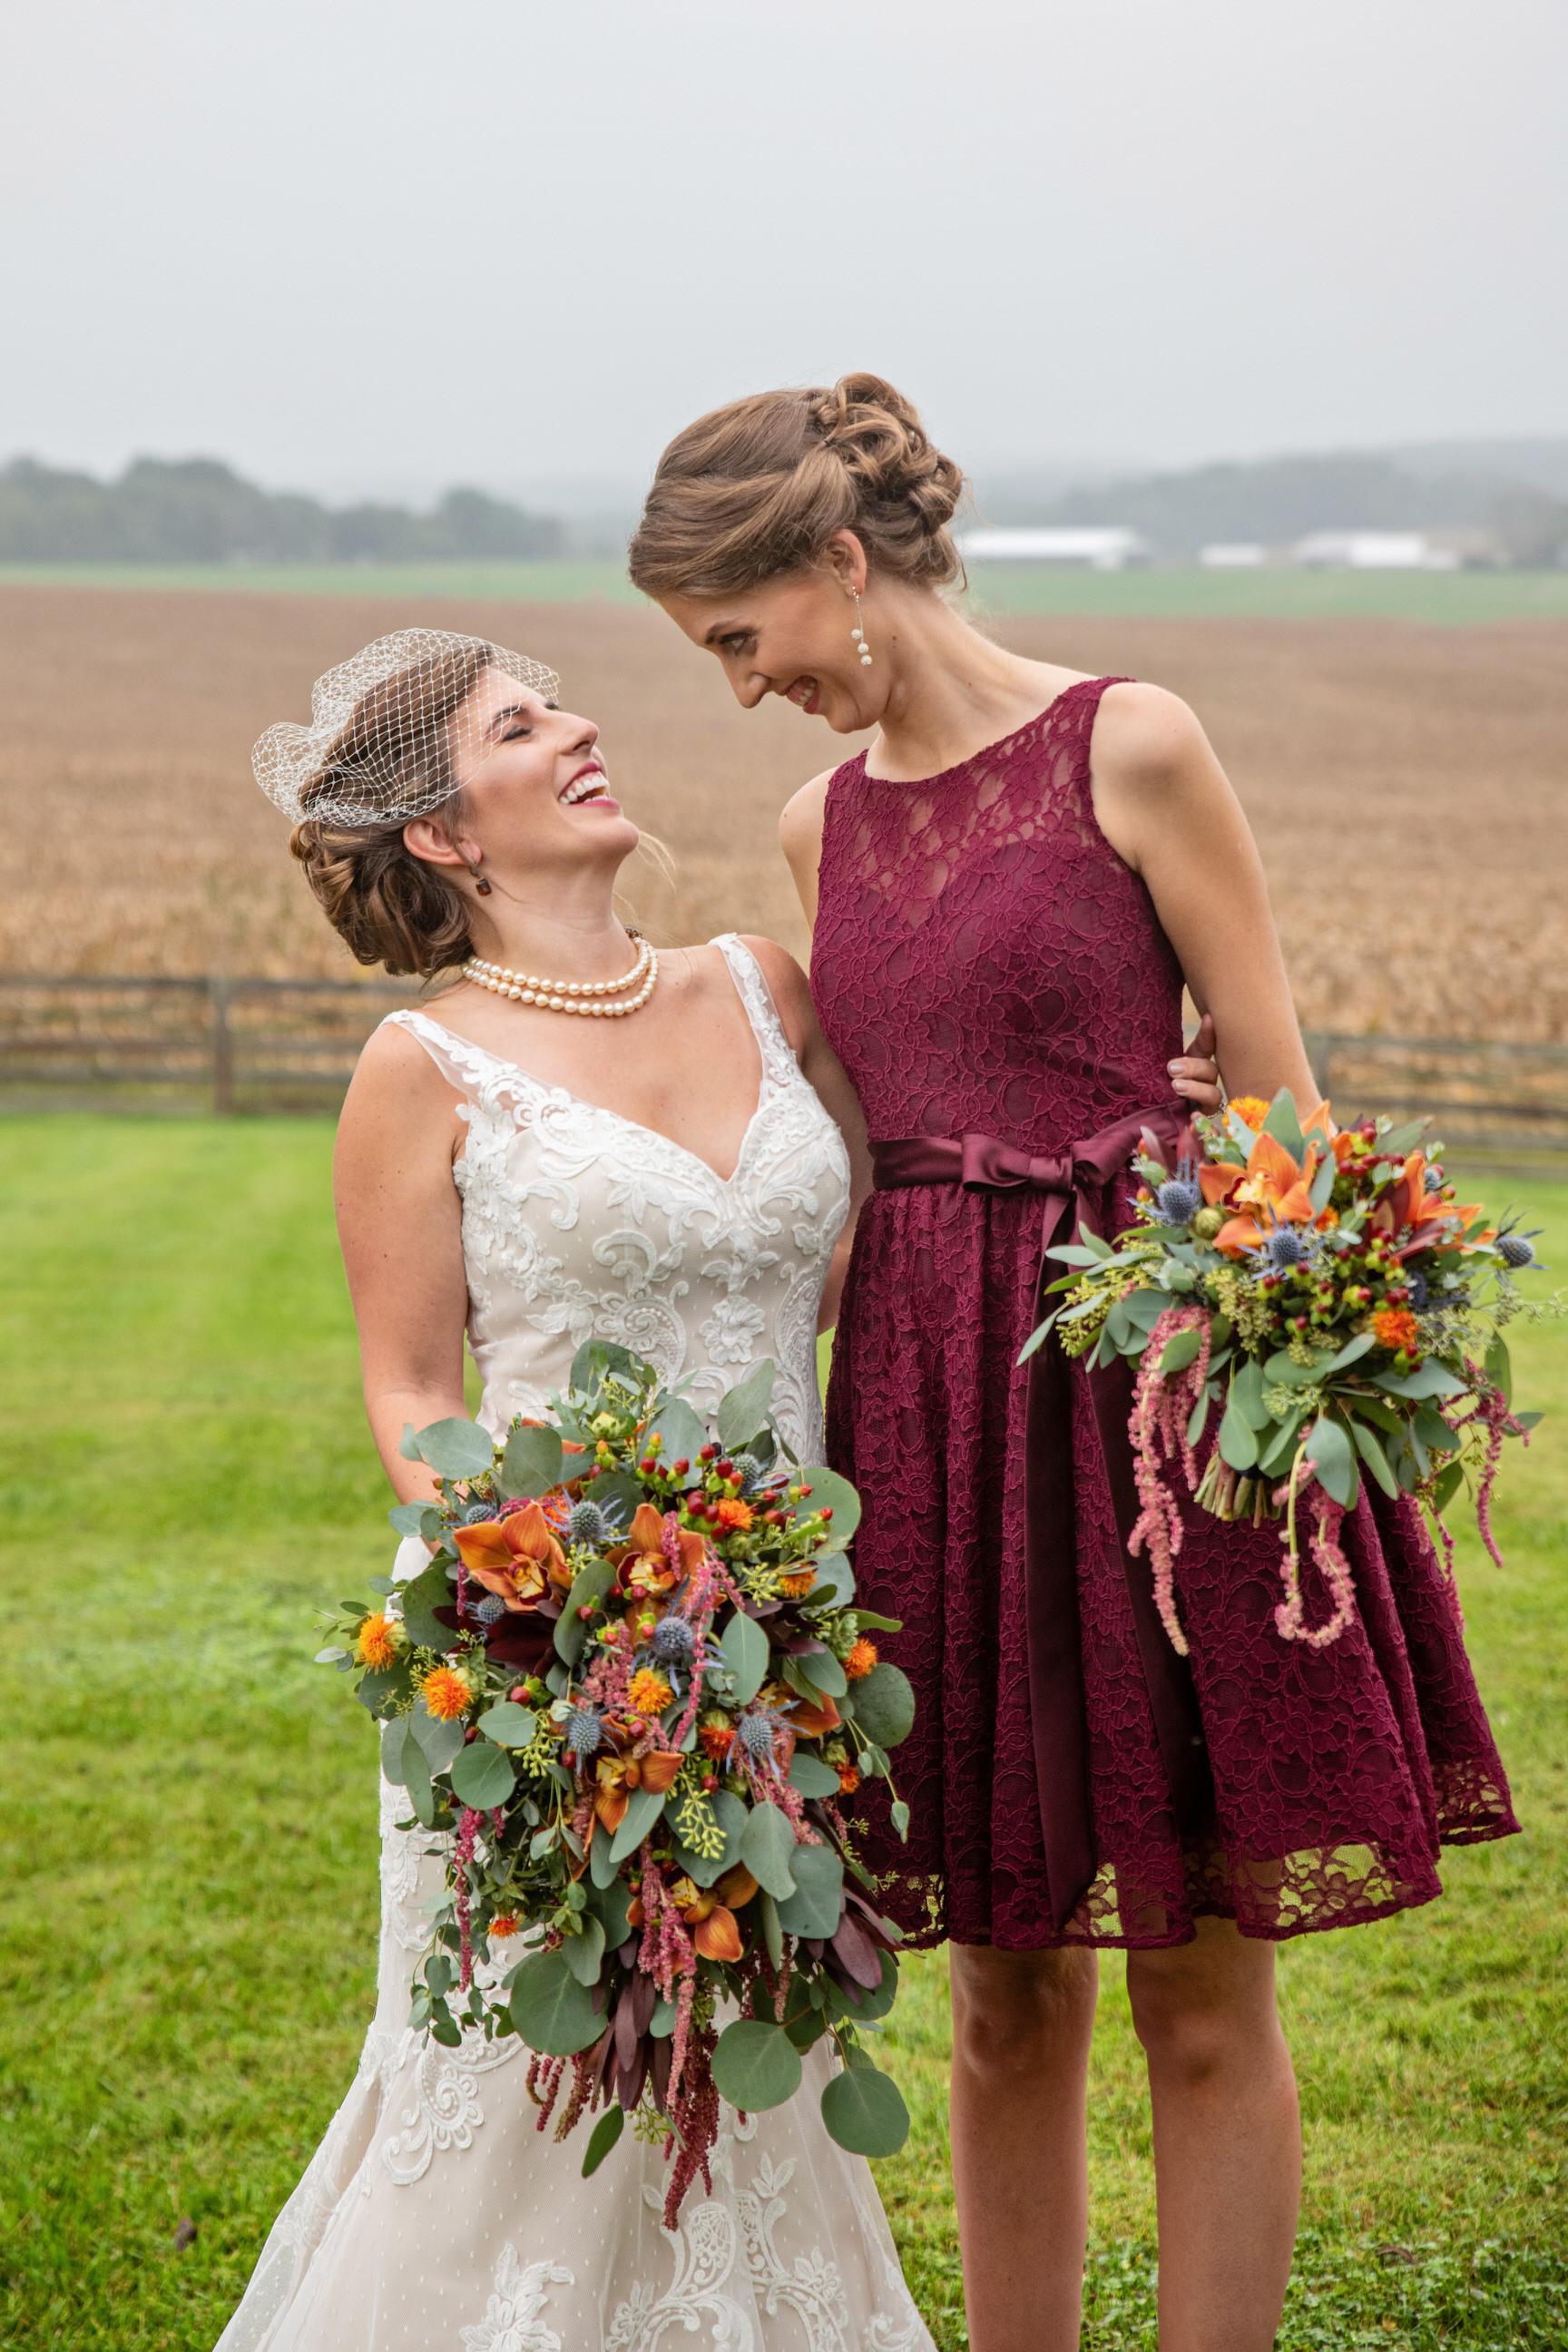 WalkersOverlookWedding-Angela&Ben-WeddingParty-8.jpg